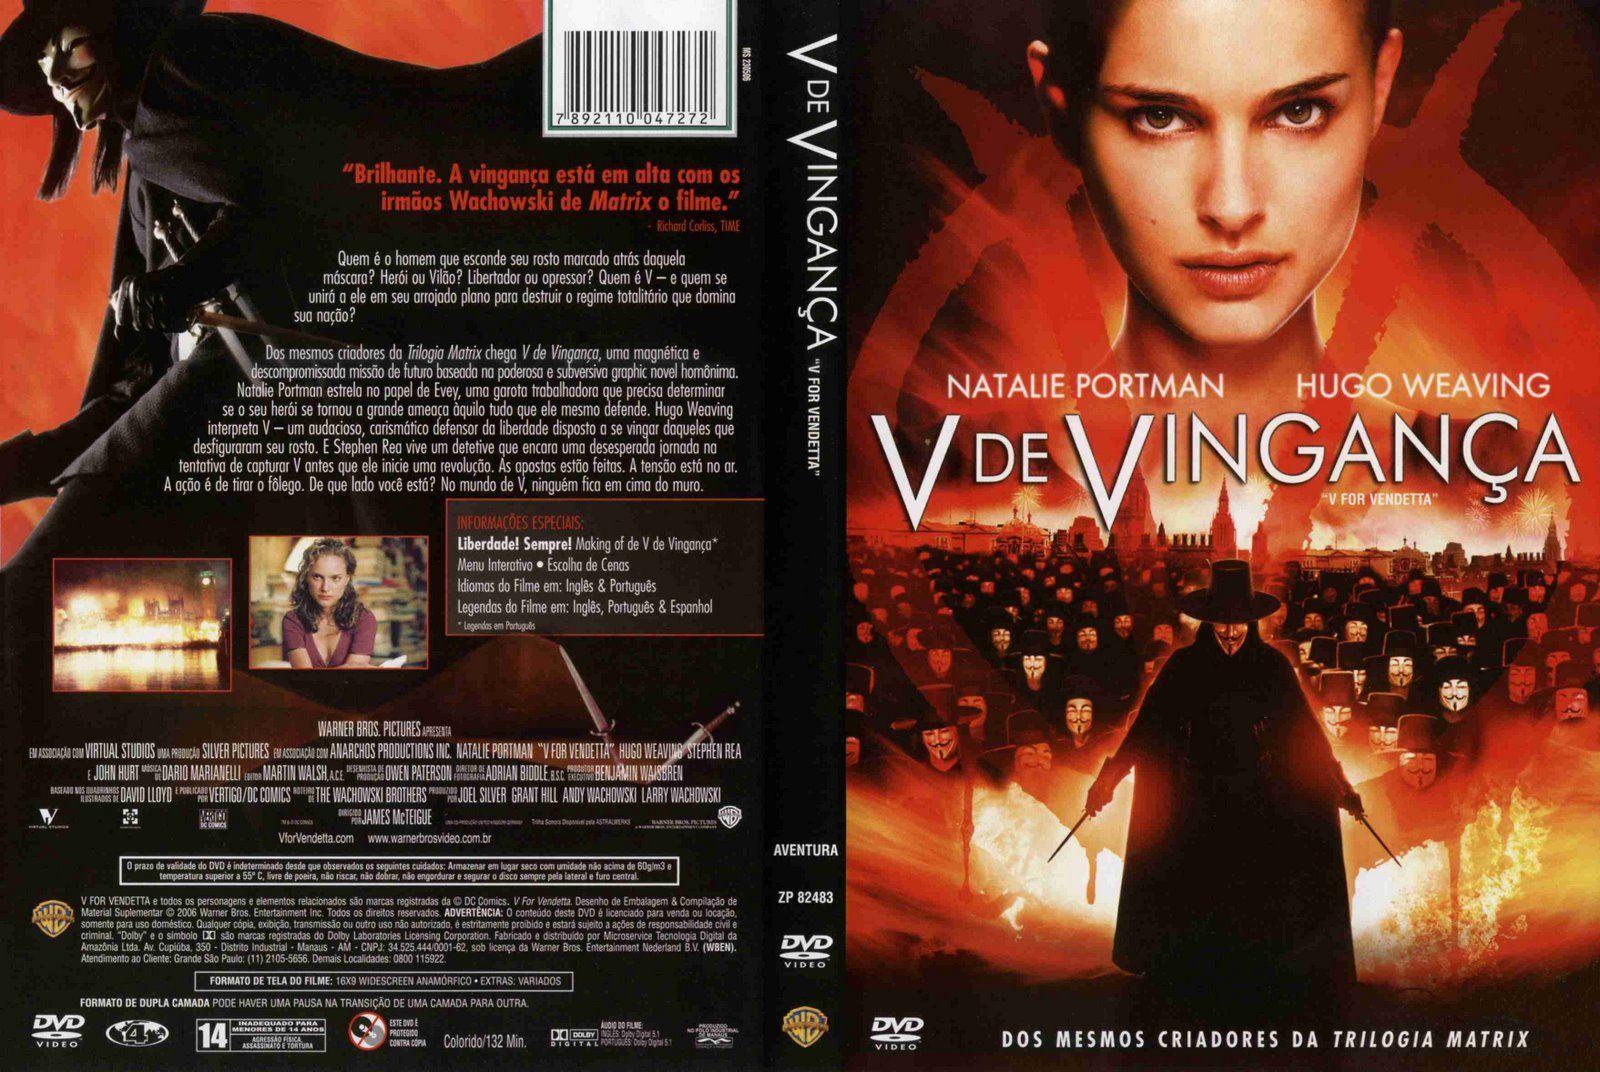 V De Vinganca 2006 Filme V De Vinganca Hugo Weaving V De Vinganca